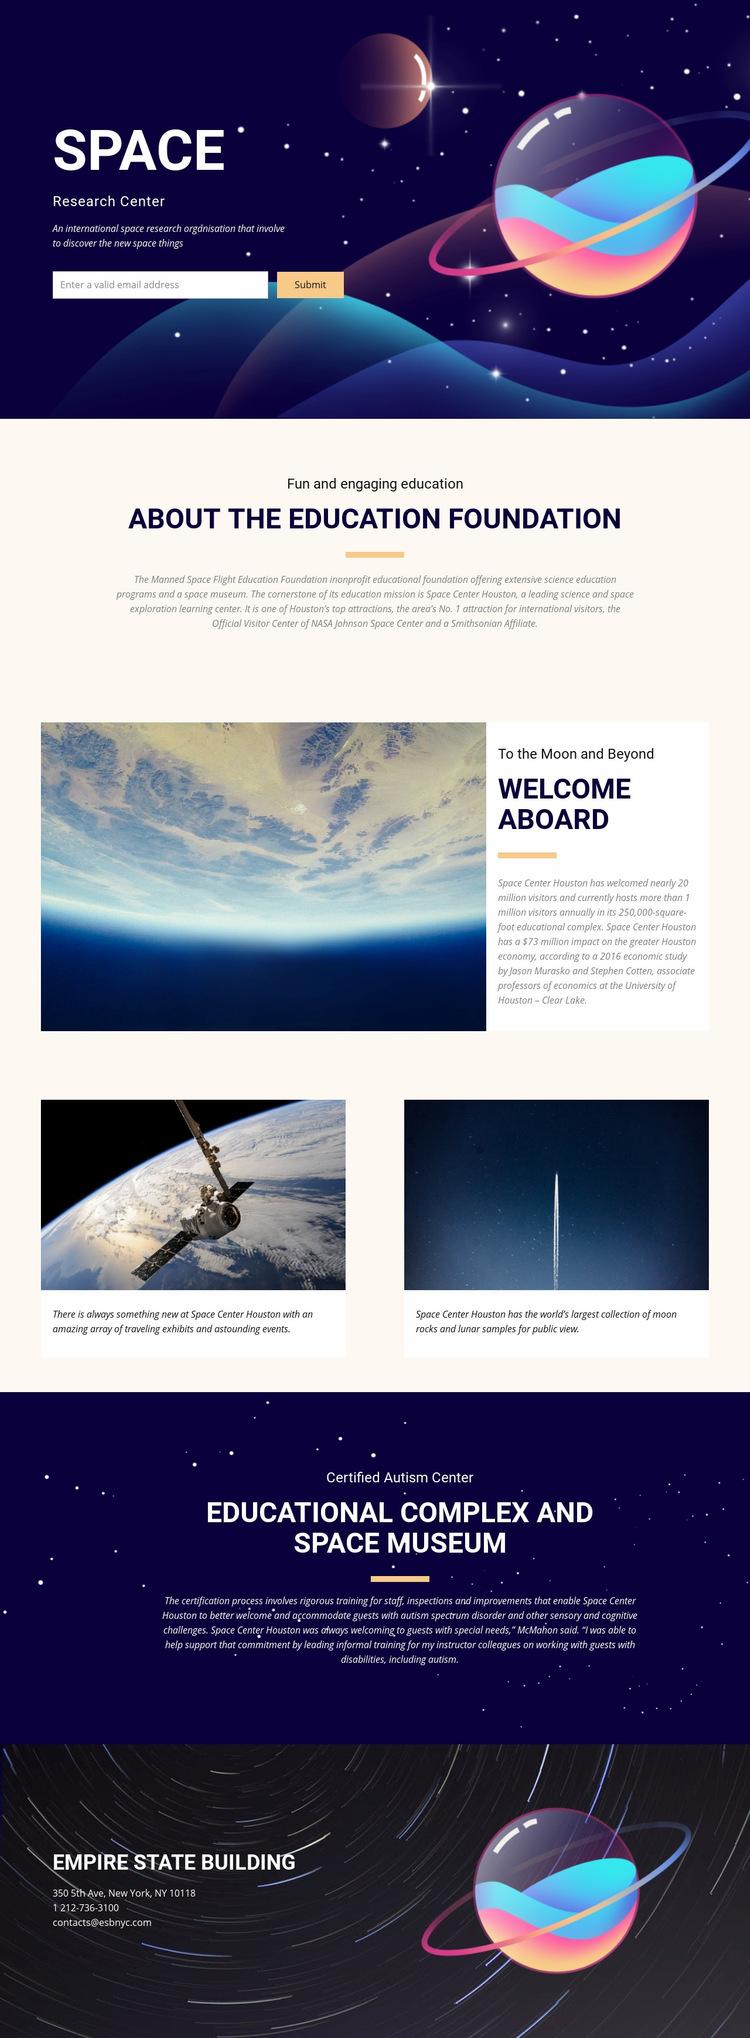 Space Web Page Design